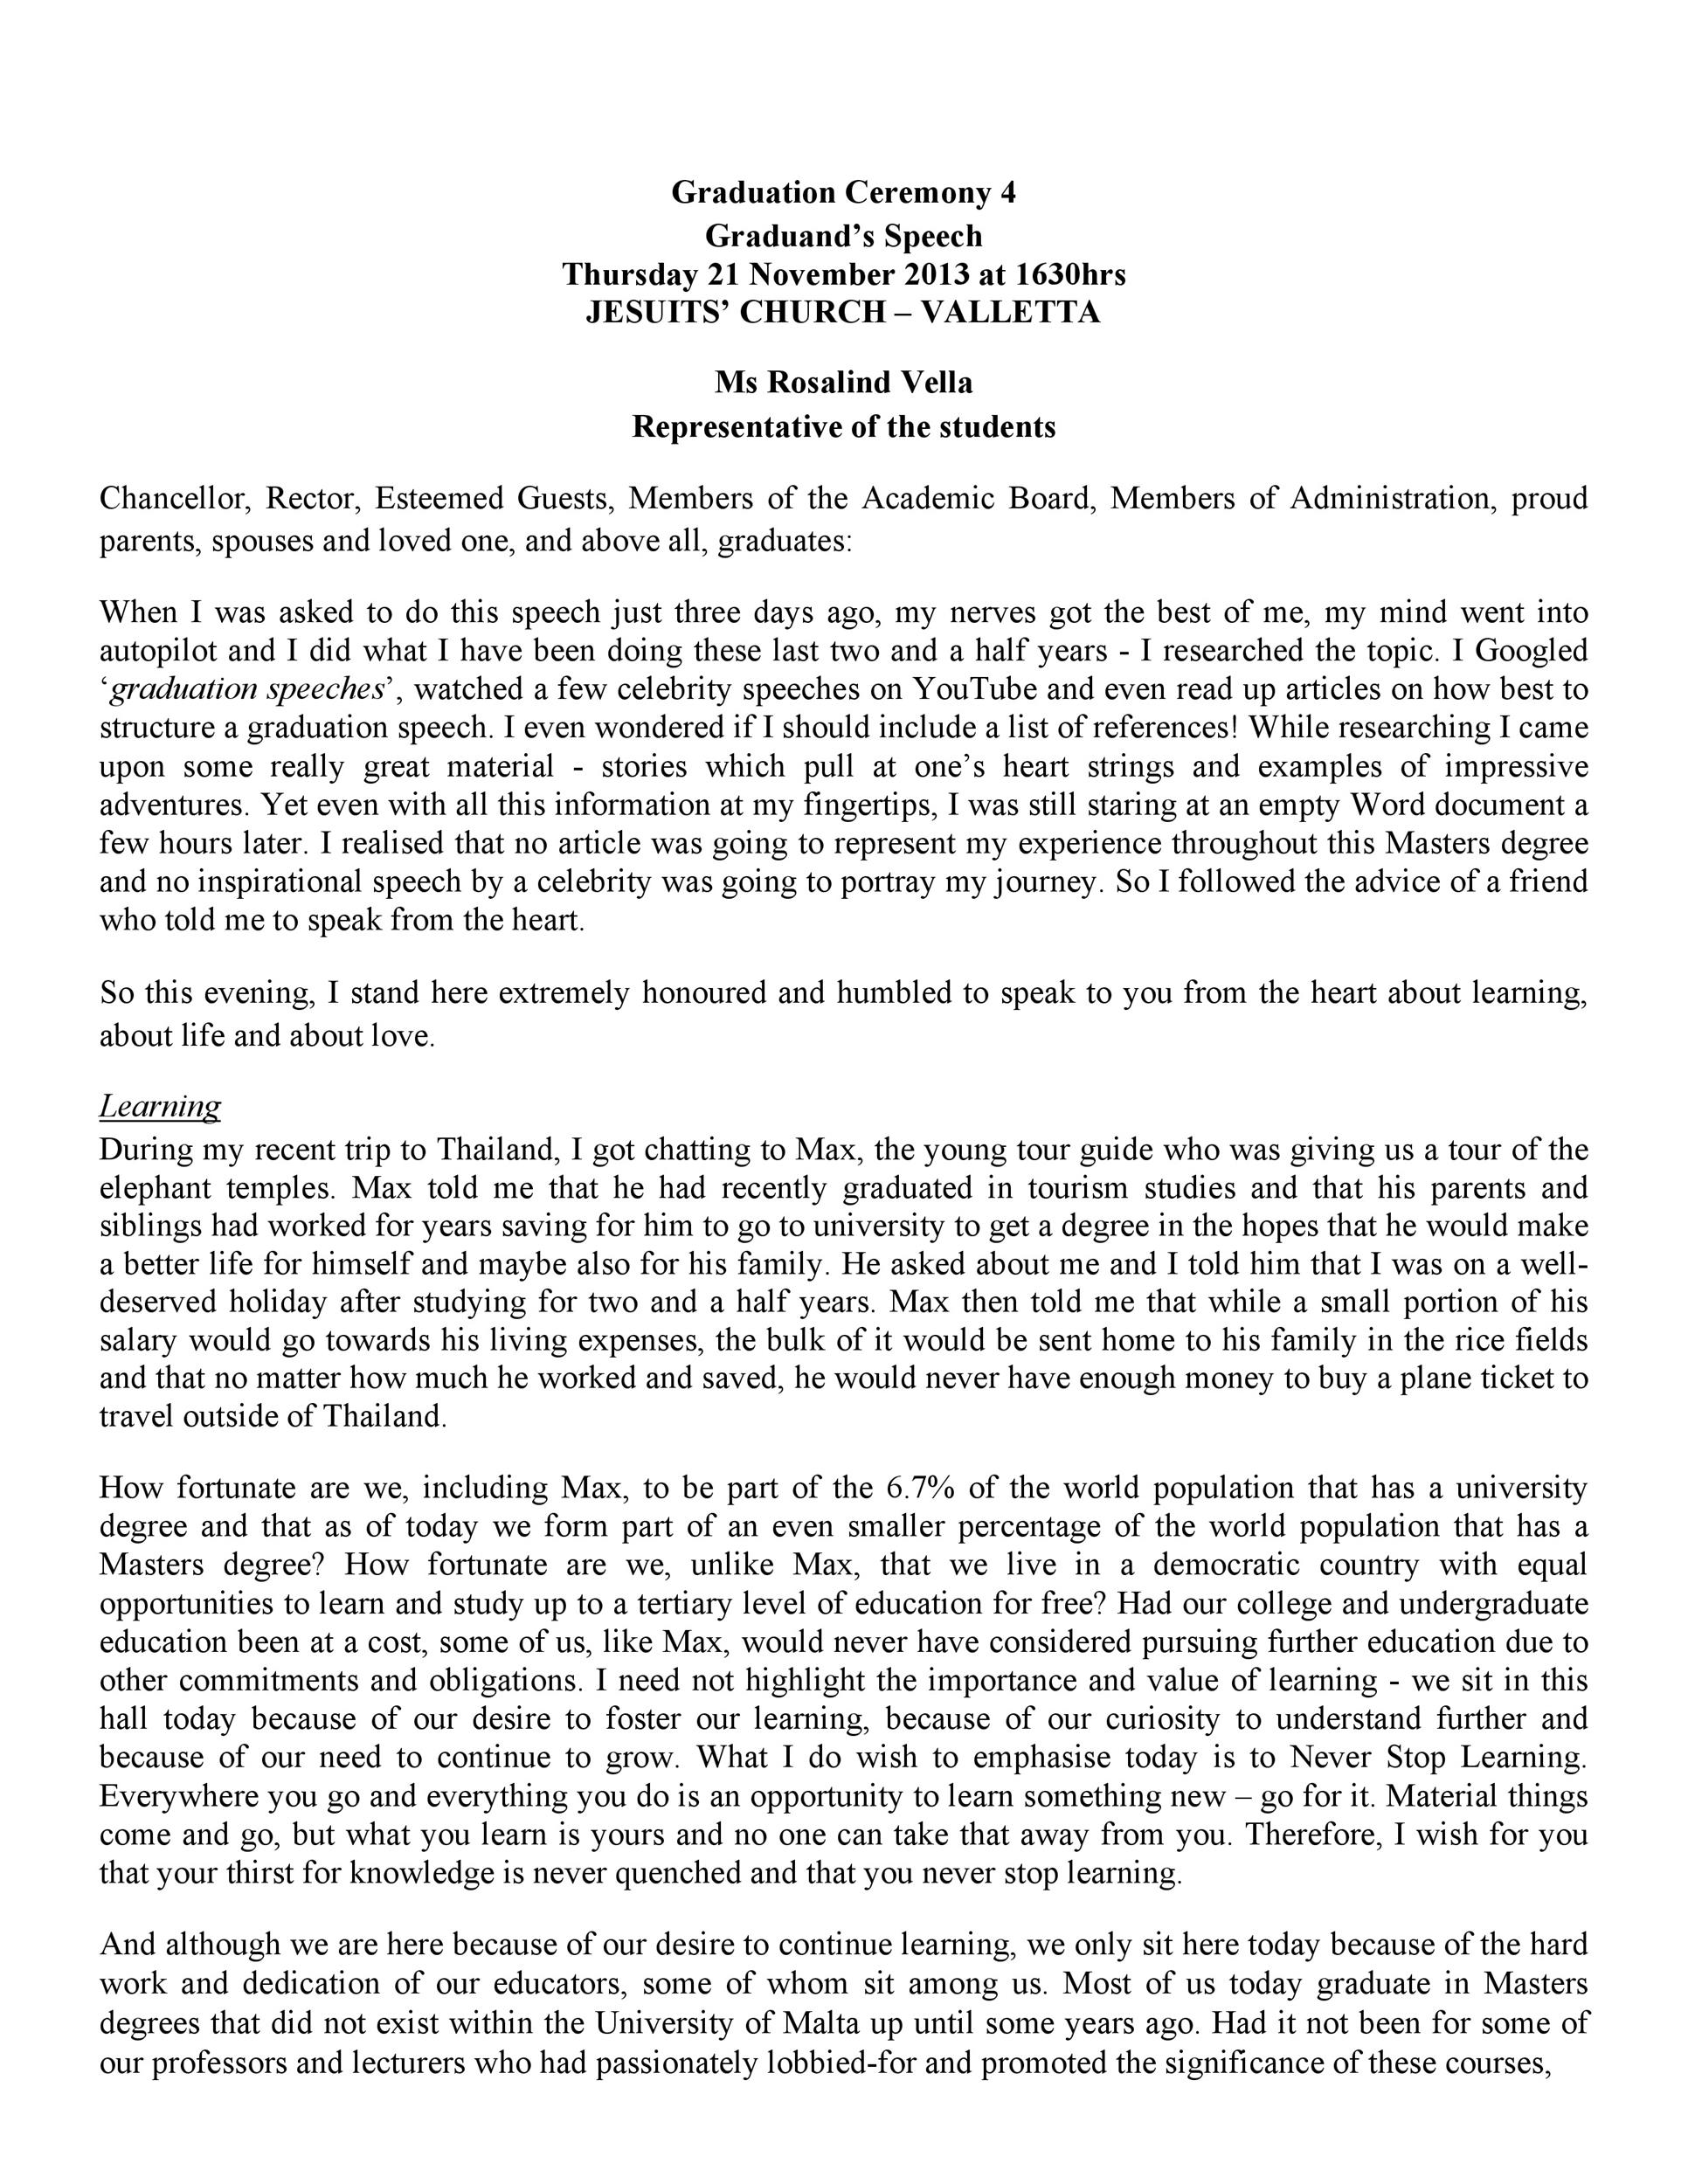 Free graduation speech example 35